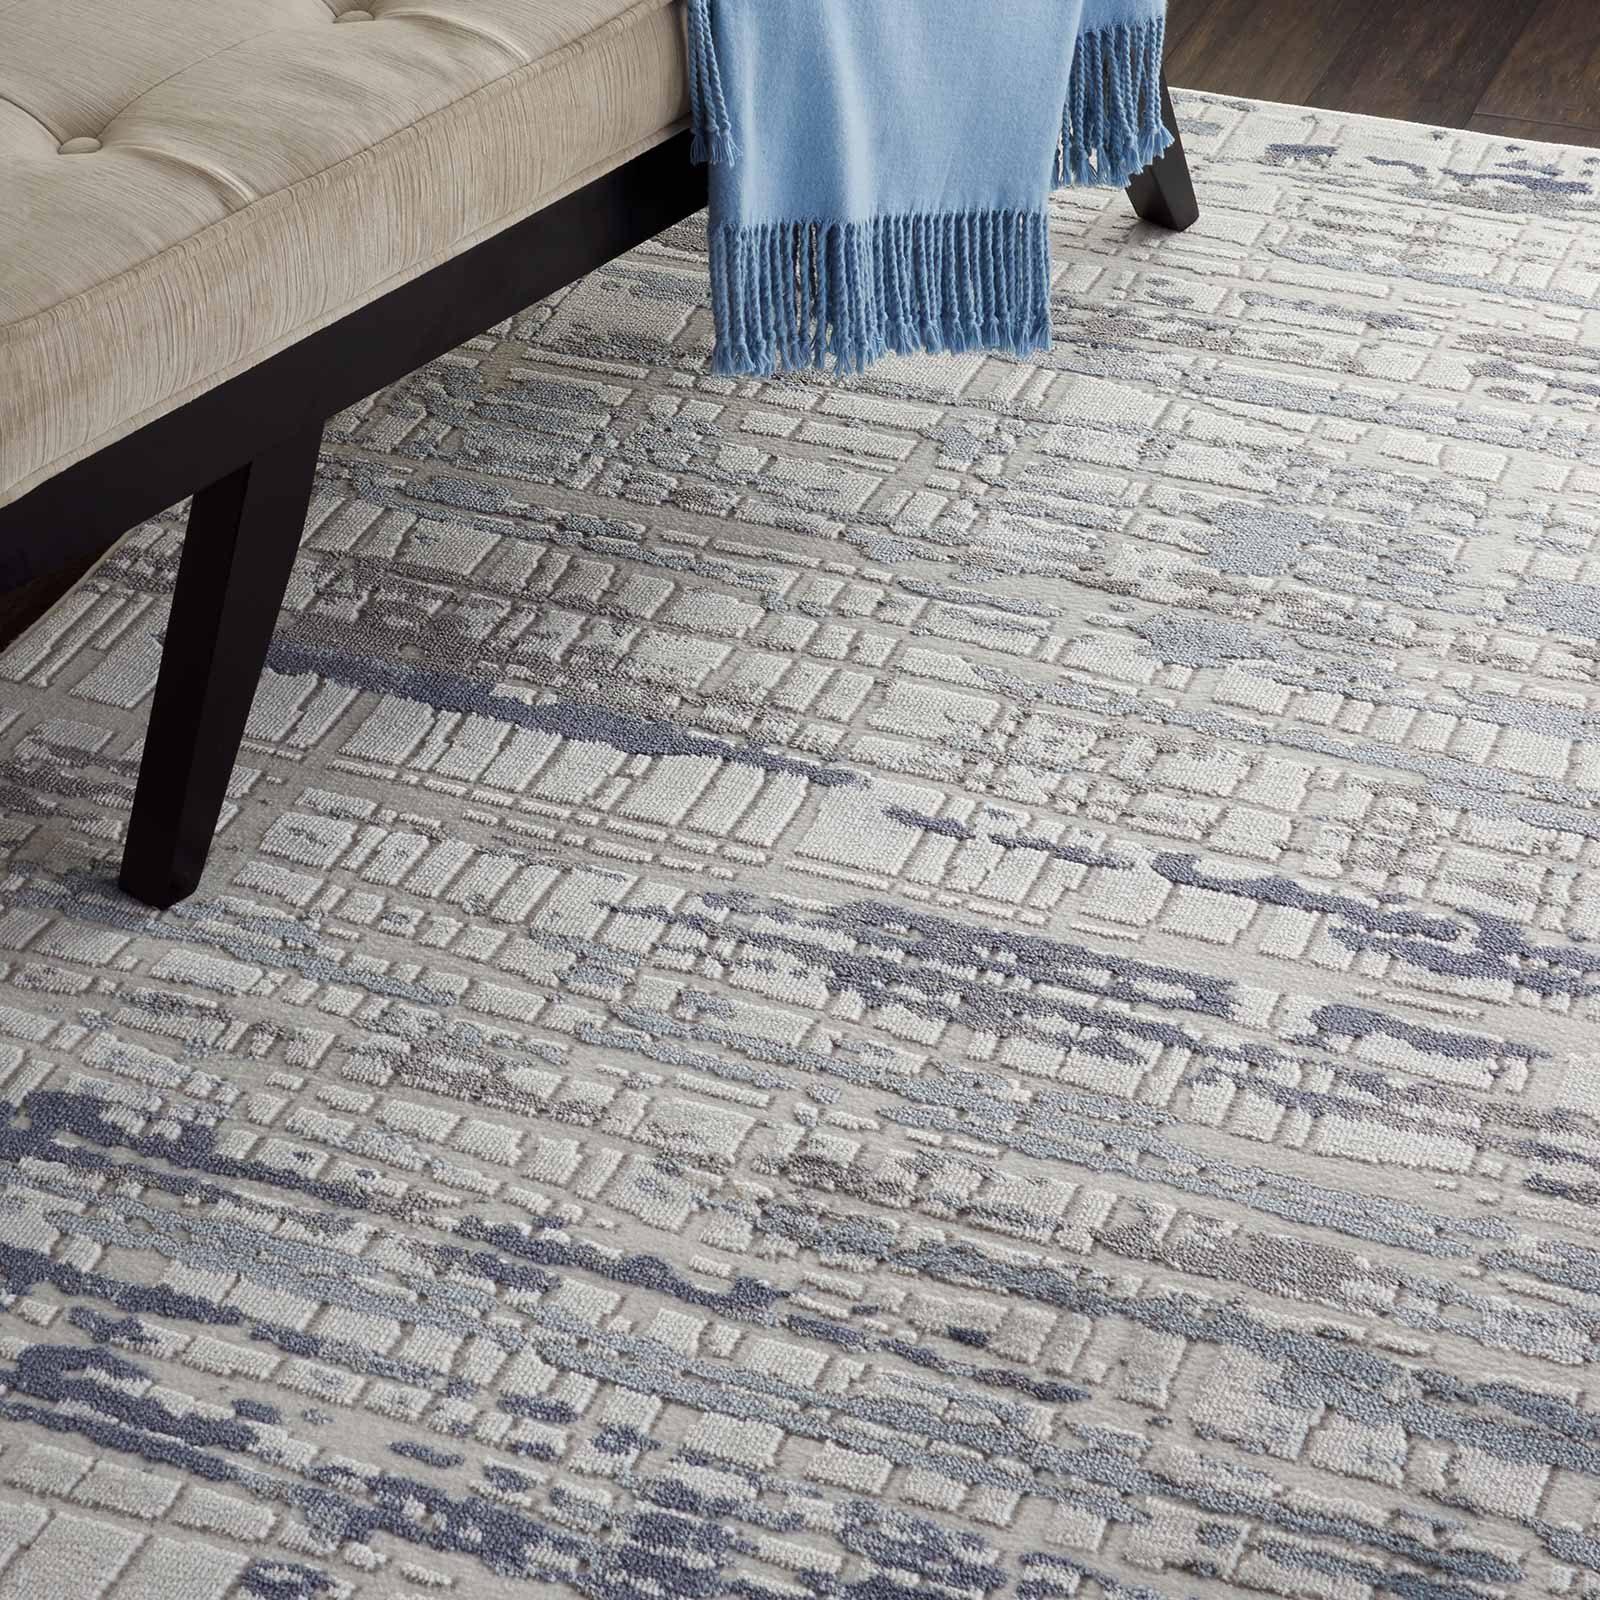 Nourison rug Urban Decor URD03 IVSLT 5x7 099446467034 interior 2 C